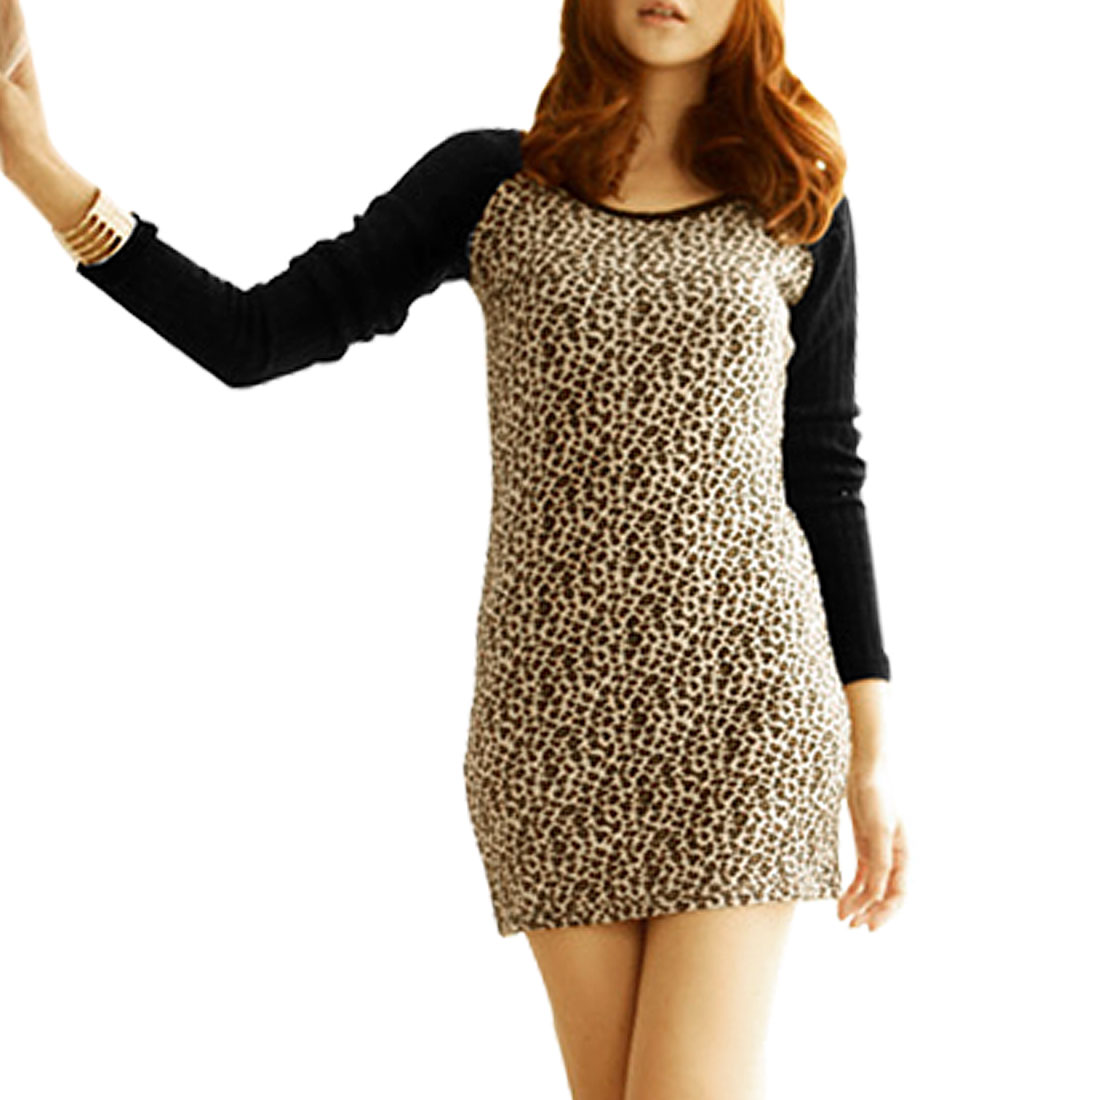 Women Round Neck Black Gray Leopard Pattern Long Sleeves Shirt XS